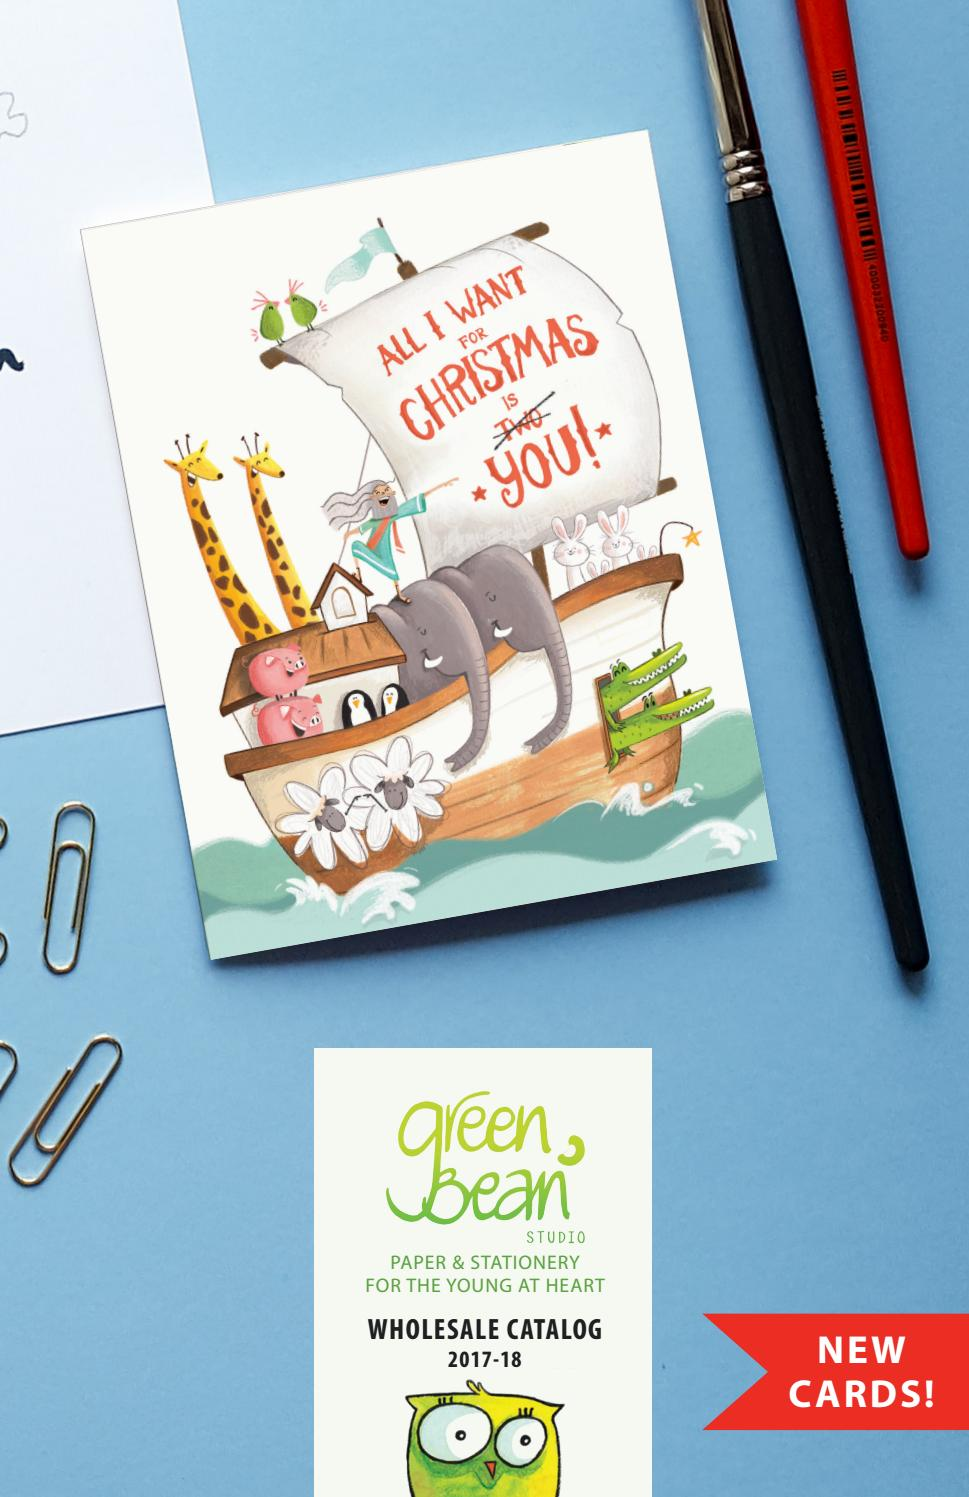 Green bean studio wholesale catalog winter update by Green Bean ...